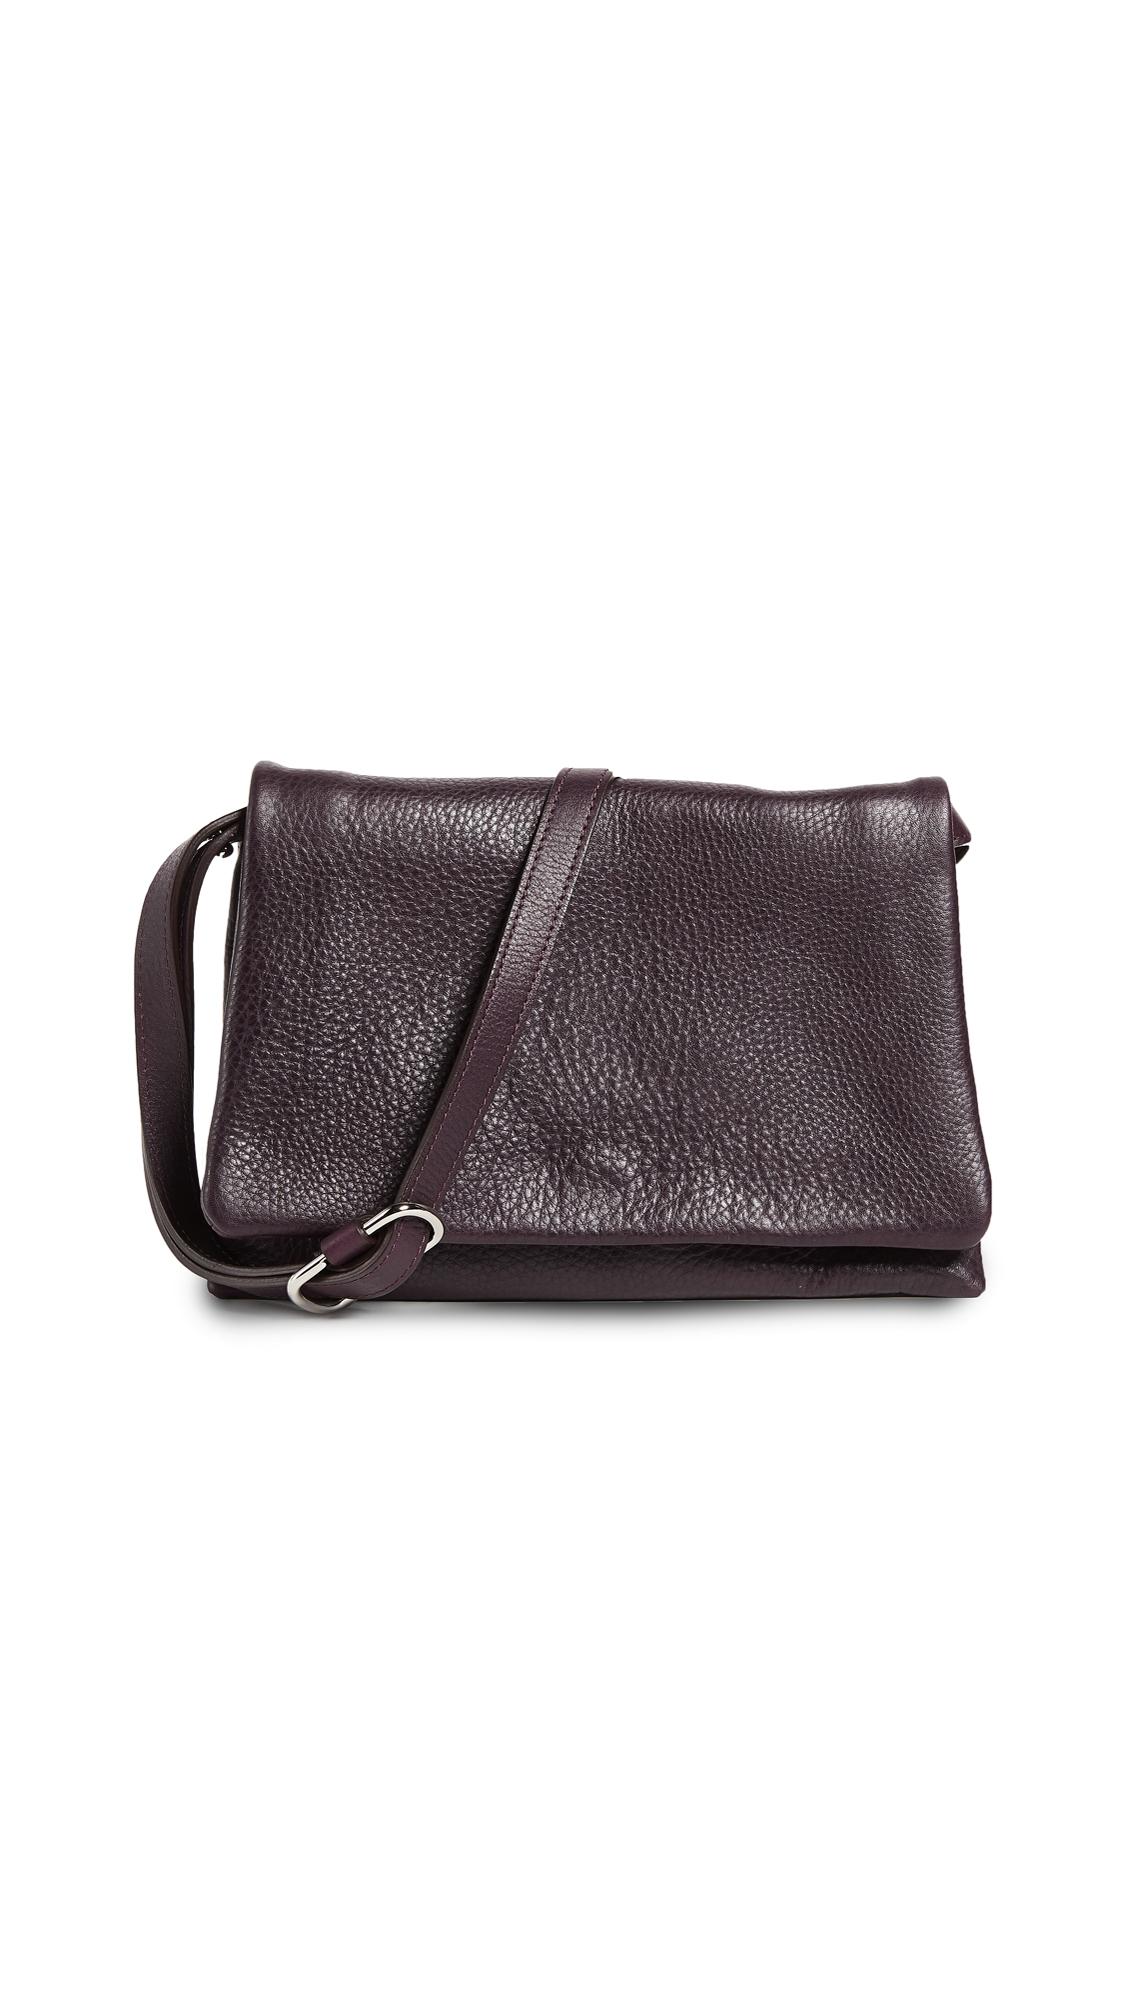 Shinola Rolled Flap Bag - Aubergine